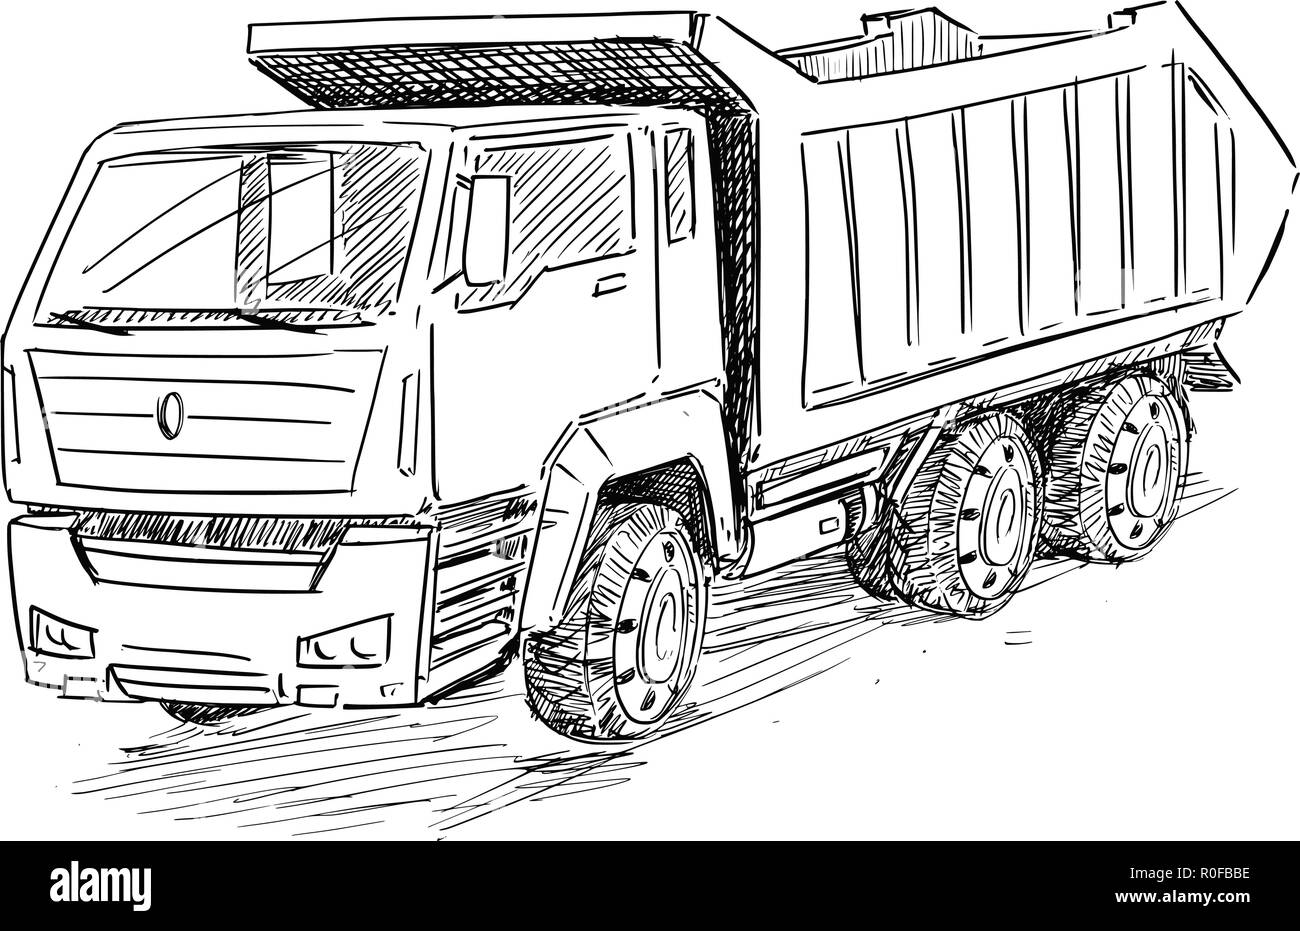 Vector Sketch Drawing Illustration of Dump Truck - Stock Vector